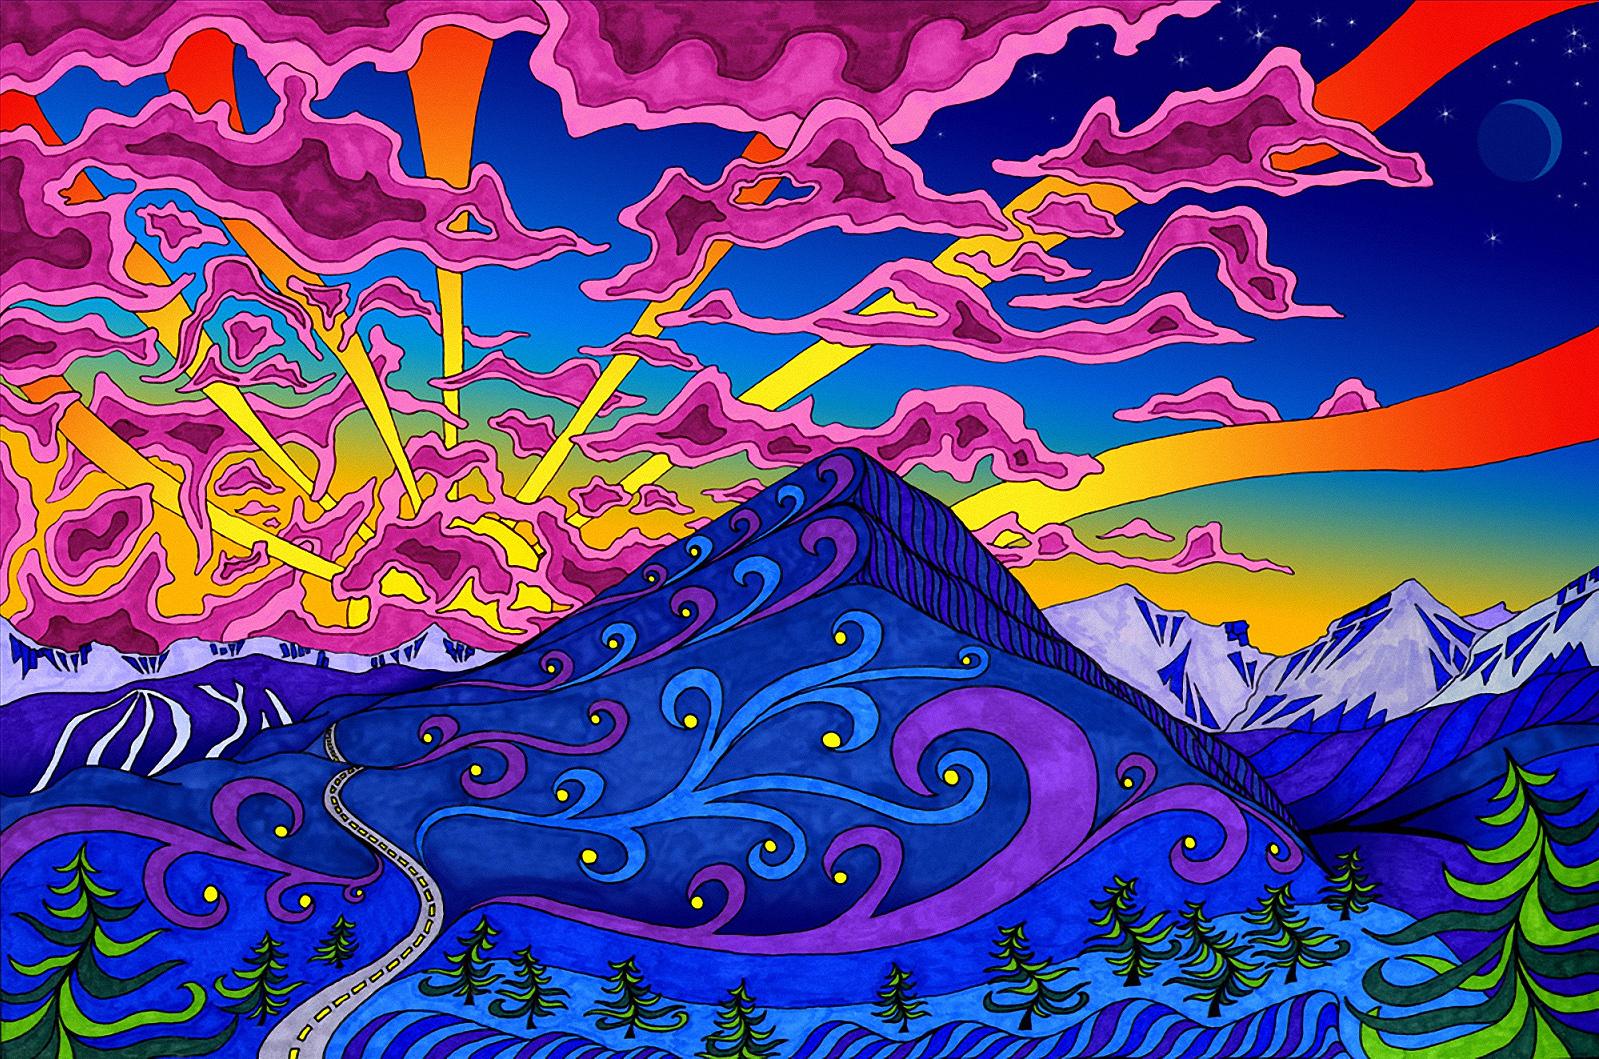 Psychedelic Computer Wallpapers Desktop Backgrounds 1920x1200 1599x1059